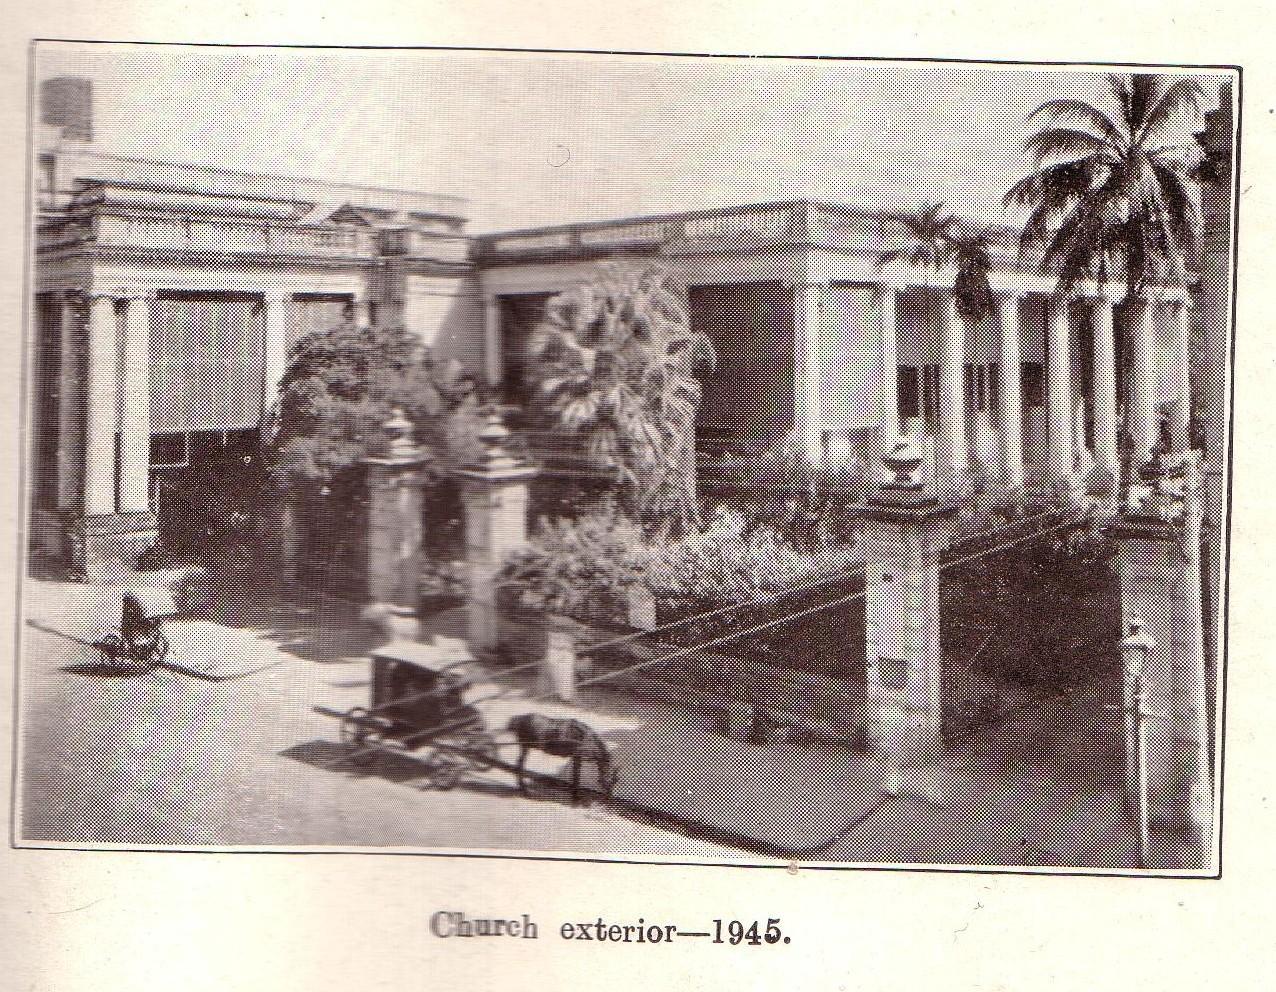 church exterior 1945